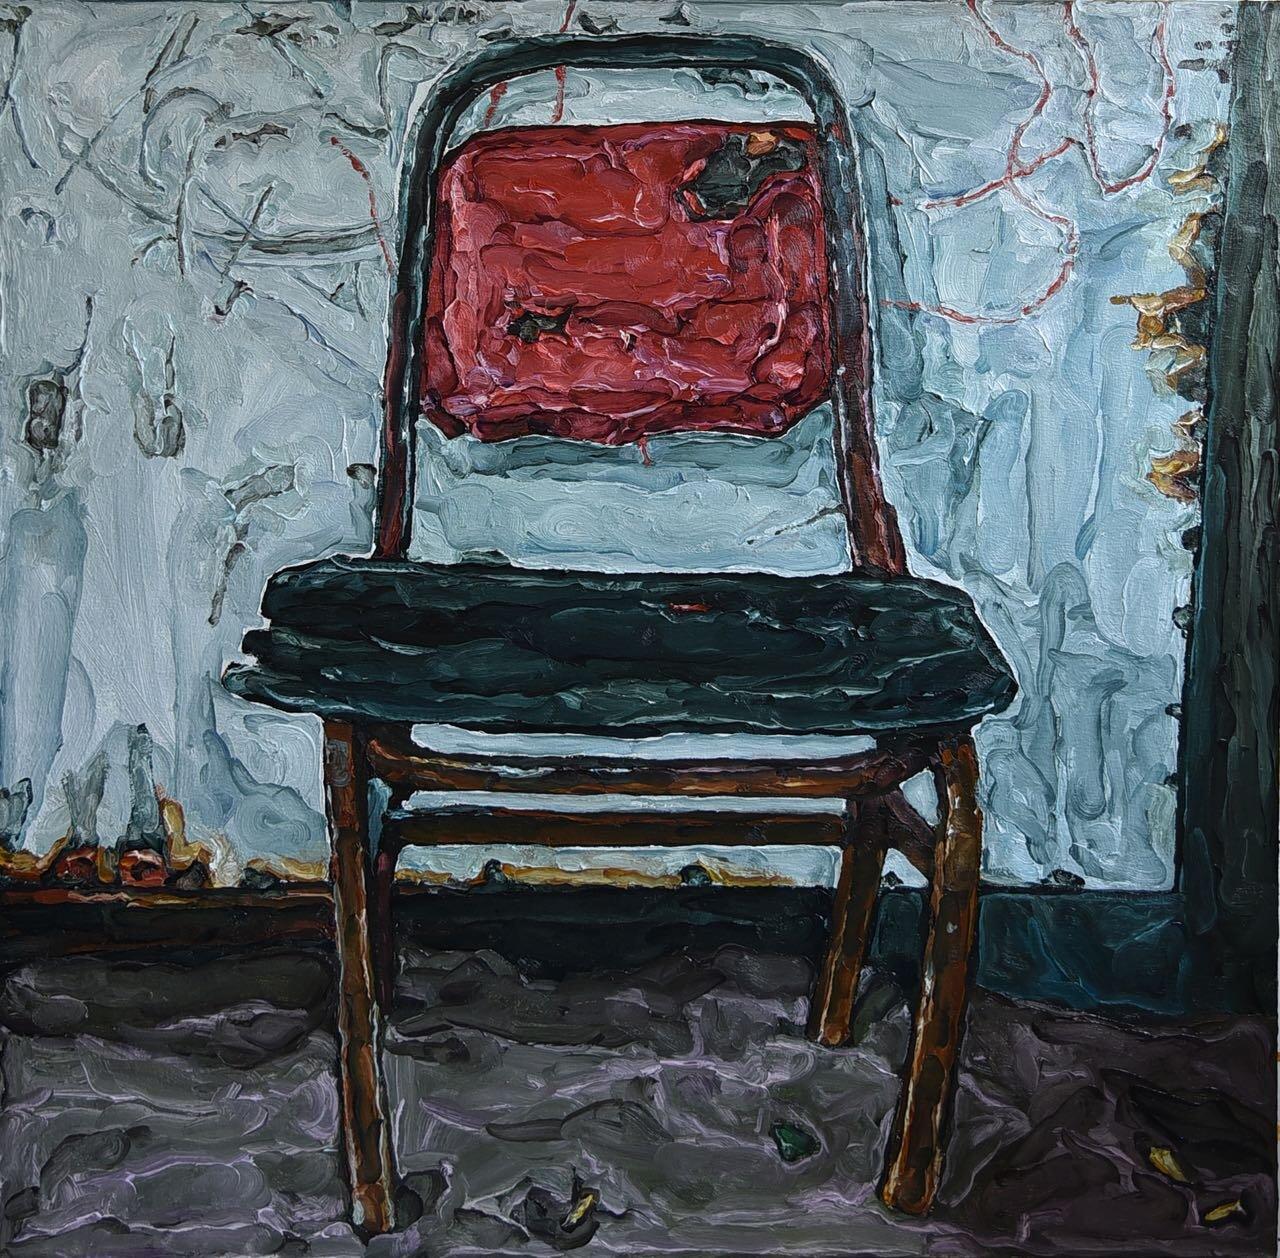 Elaine ROBERTO NAVAS  Fire (After MM Yu)  2019 Oil on canvas H121.9 x W121.9